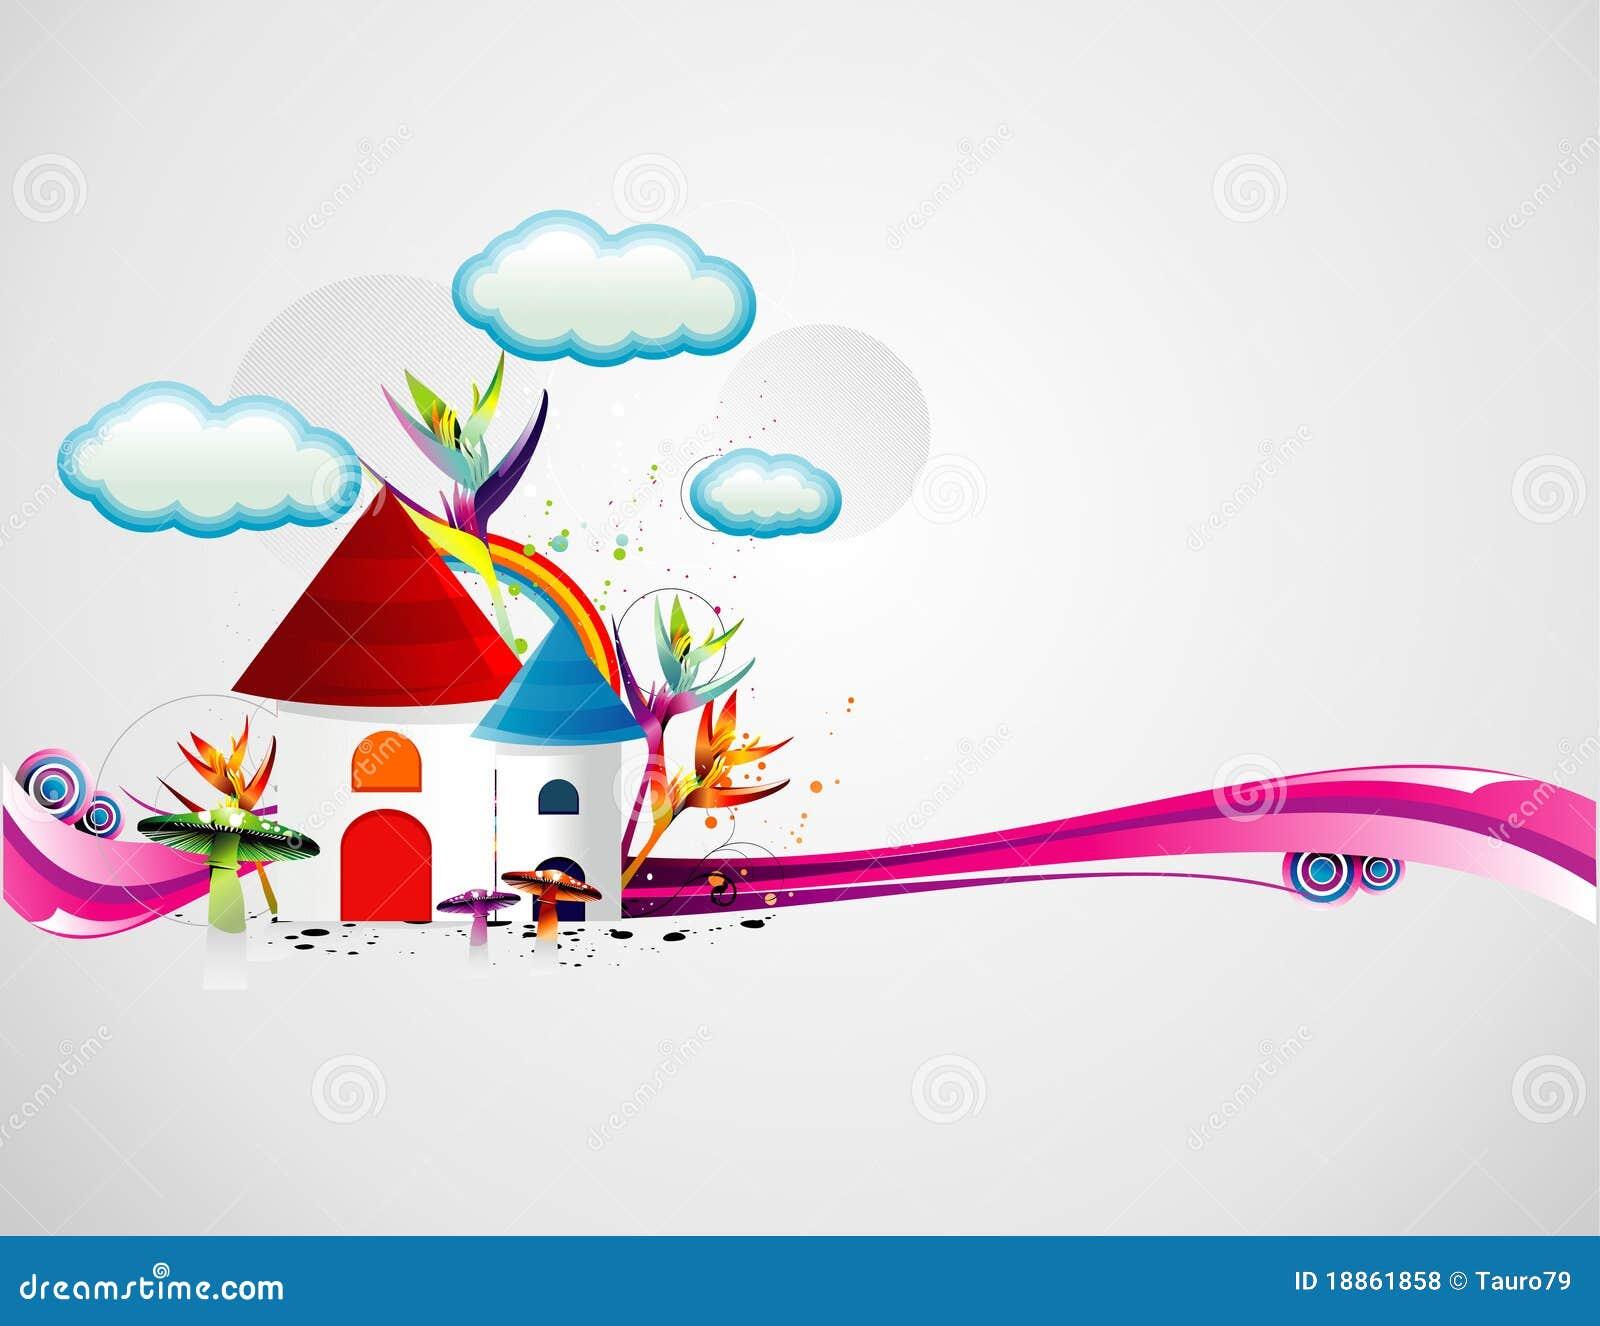 Cartoon houses illustration